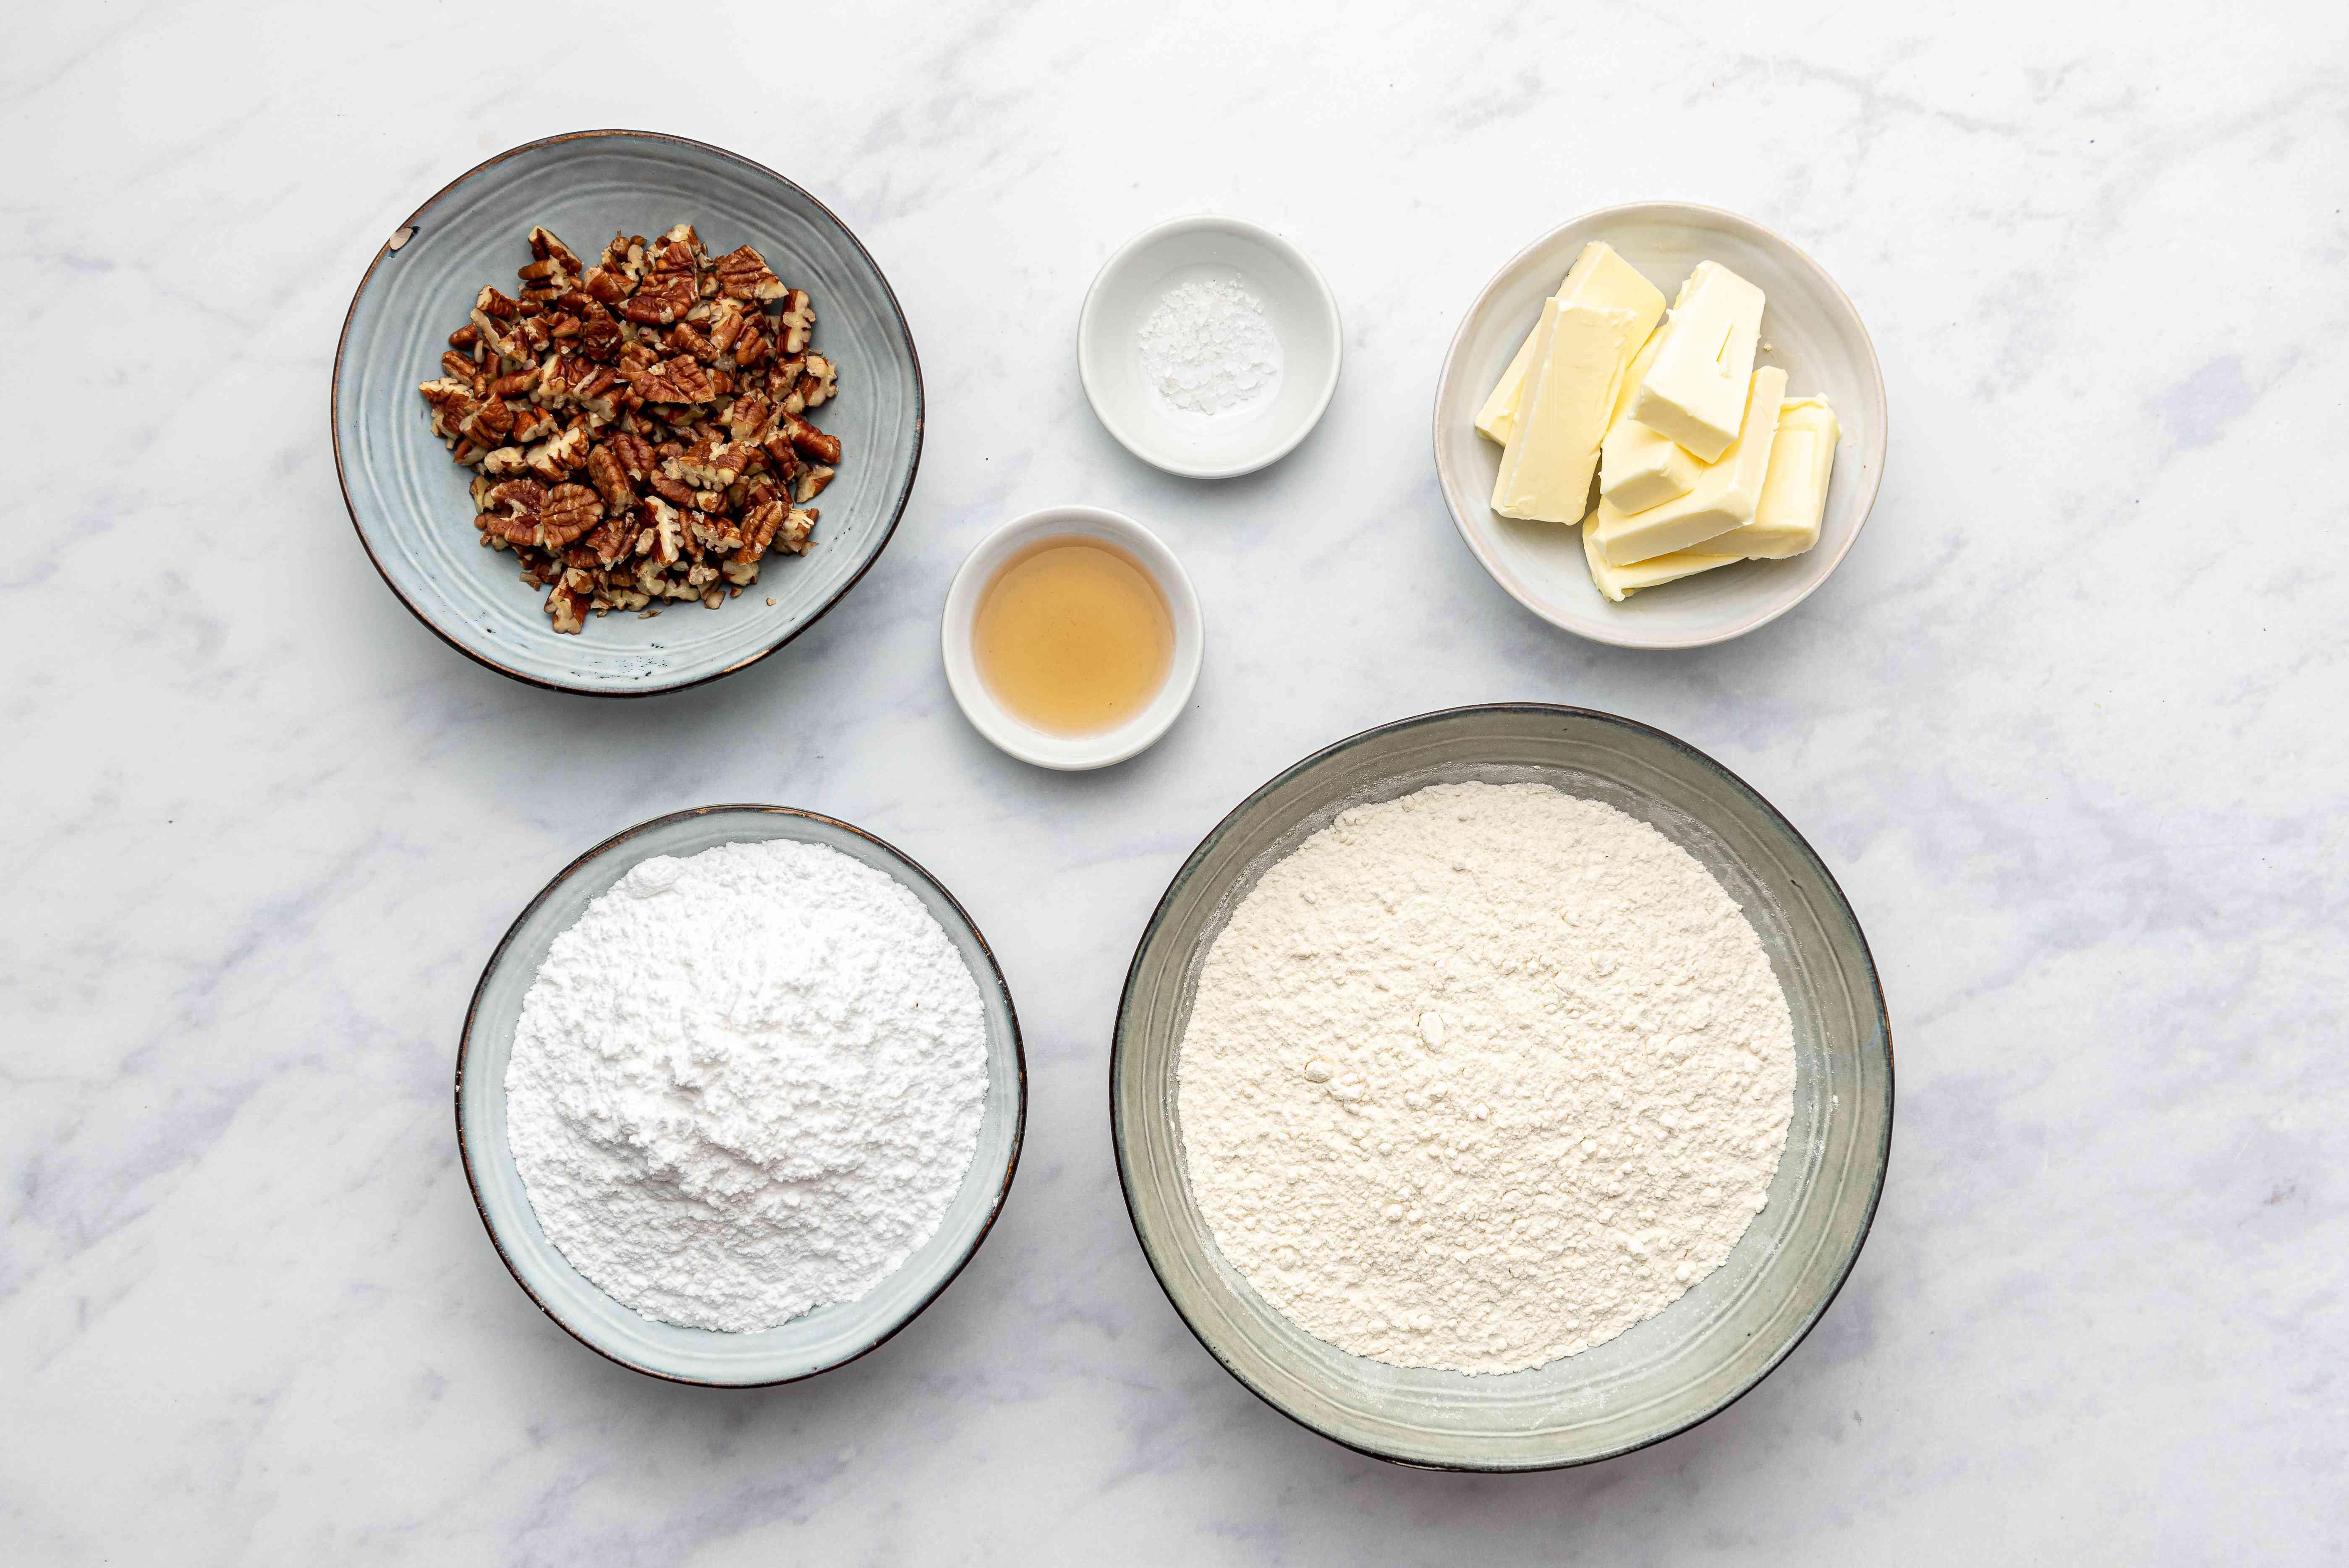 Mexican Tea Cakes ingredients